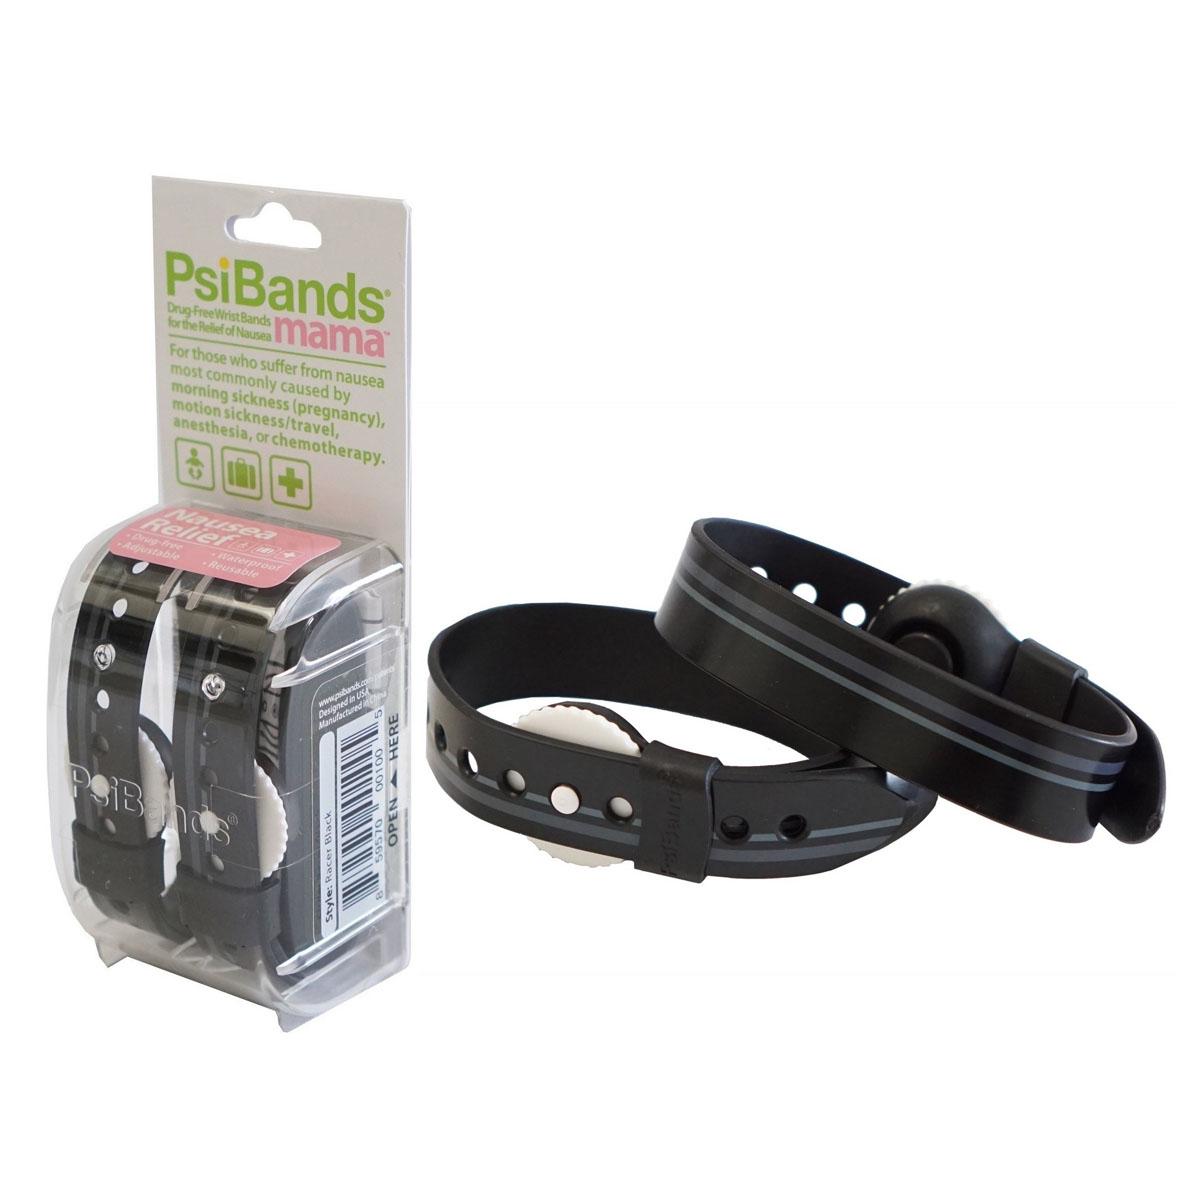 Psi Bands Mama Nausea Relief Wrist Band PSI859570001005